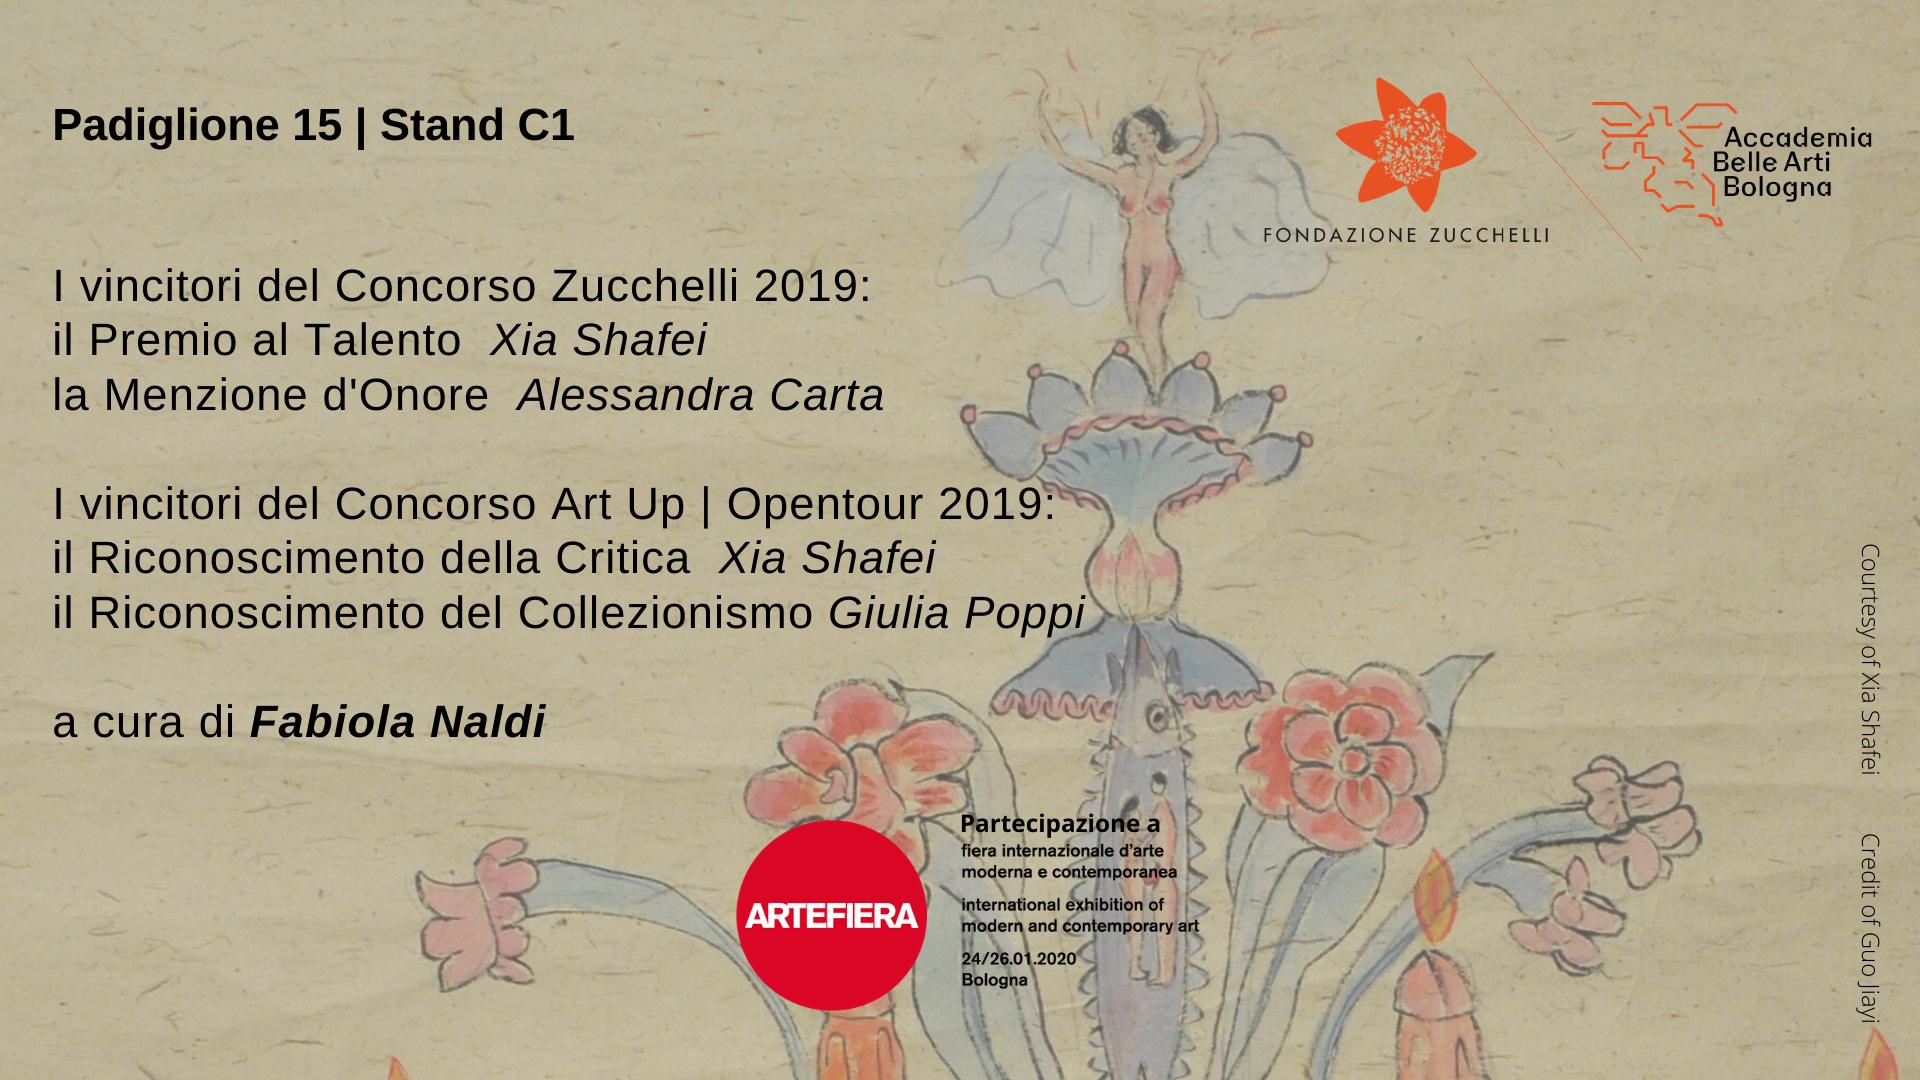 ARTEFIERA 2019 Bologna 13-01-2020